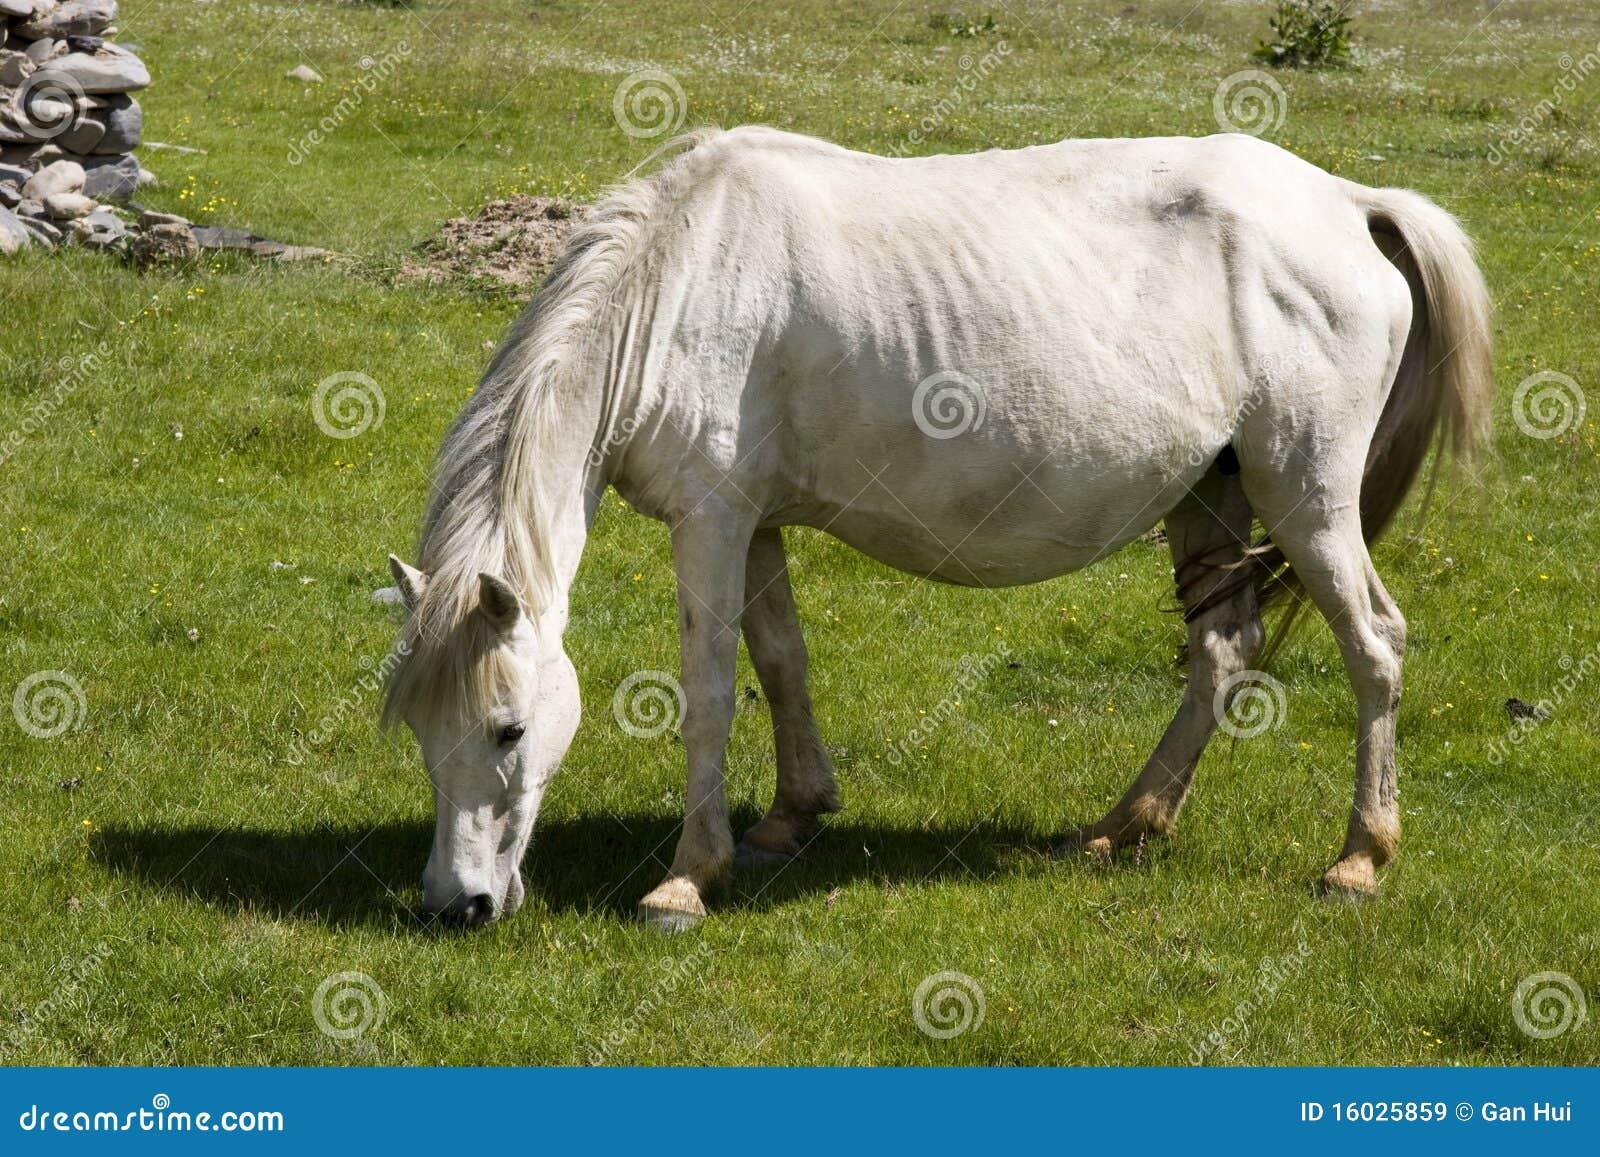 White horse eating grass - photo#3